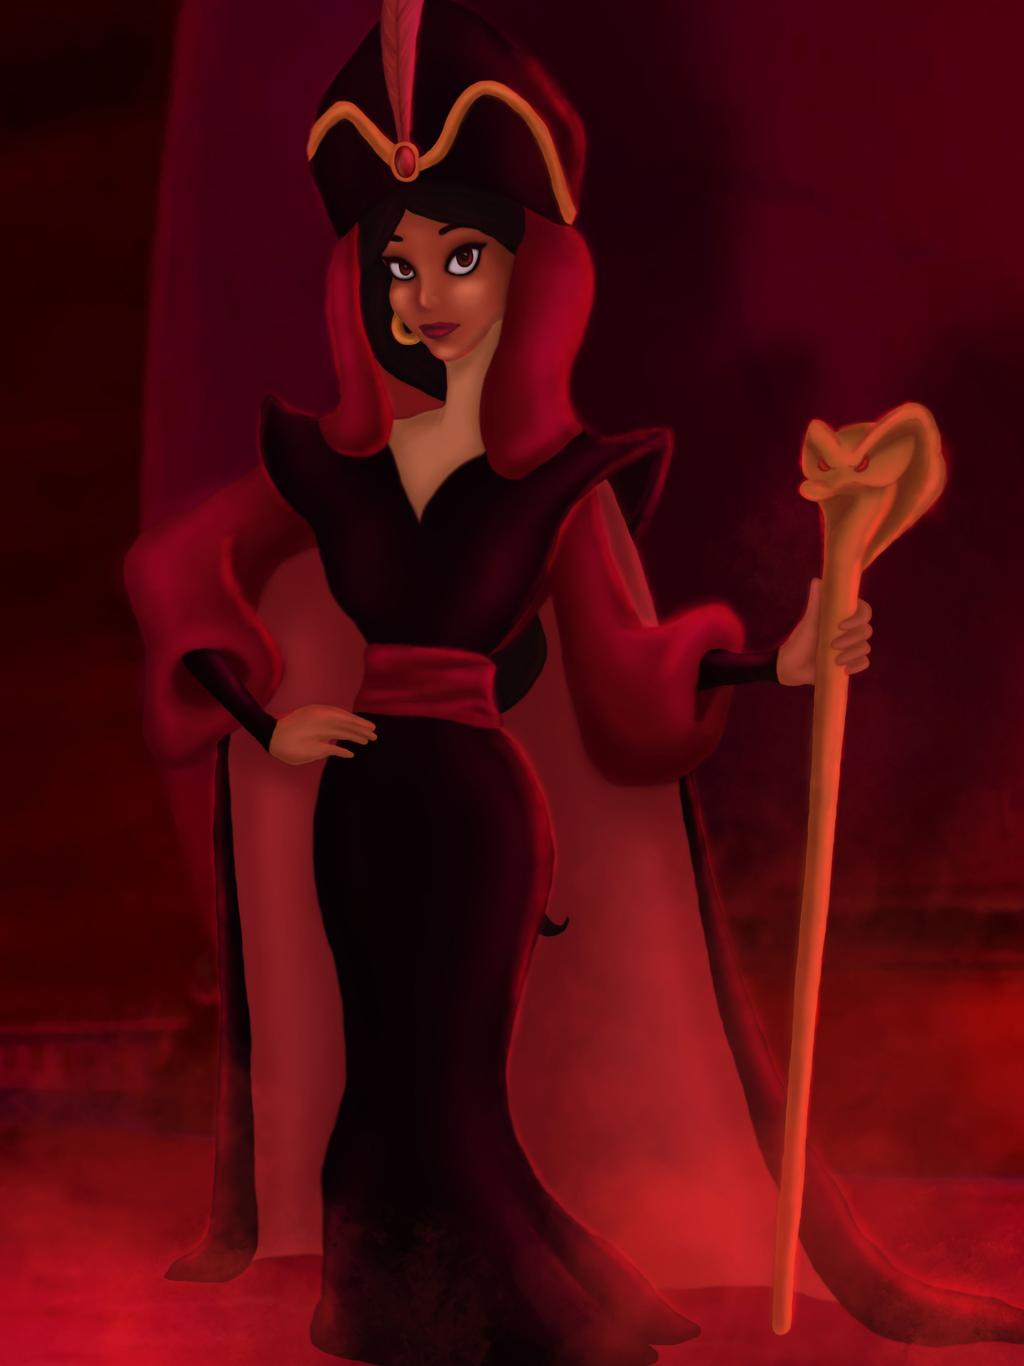 Disney princesses reimagined as villains 12